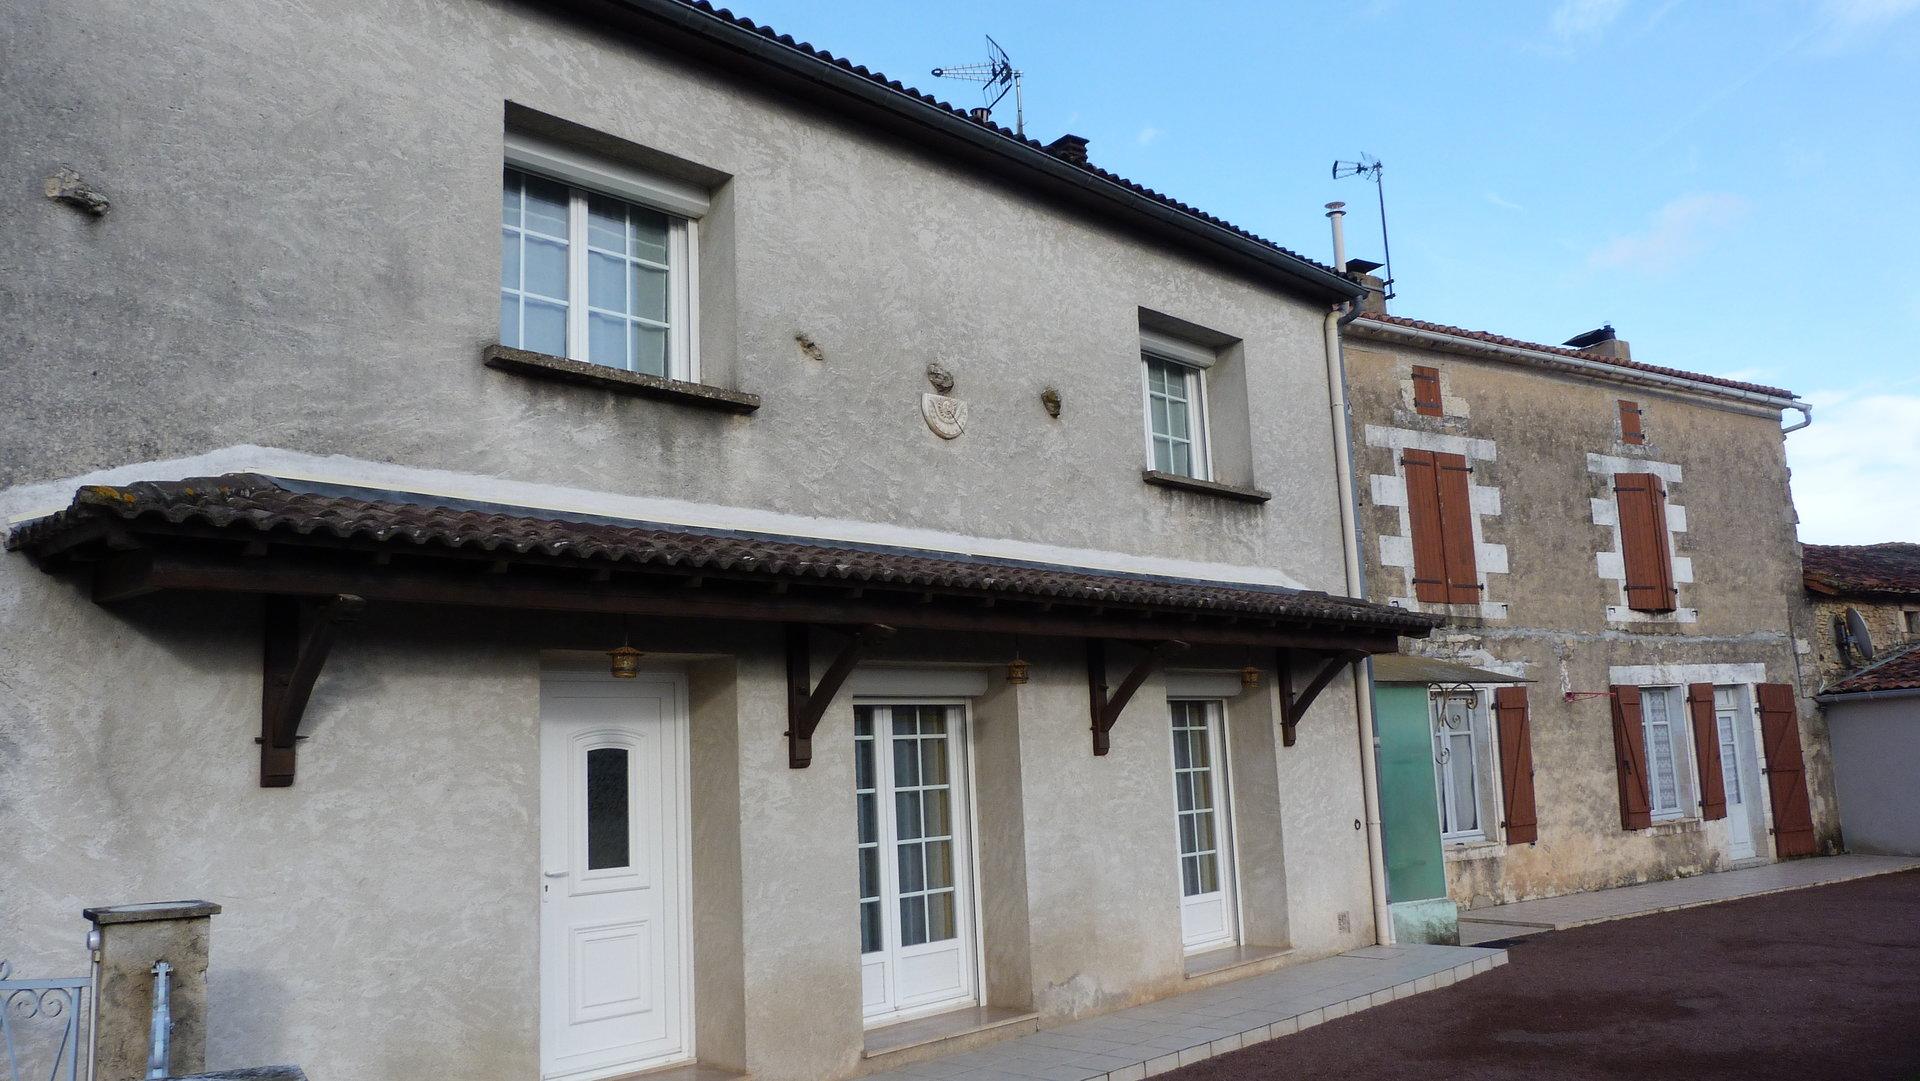 2 adjoining village houses